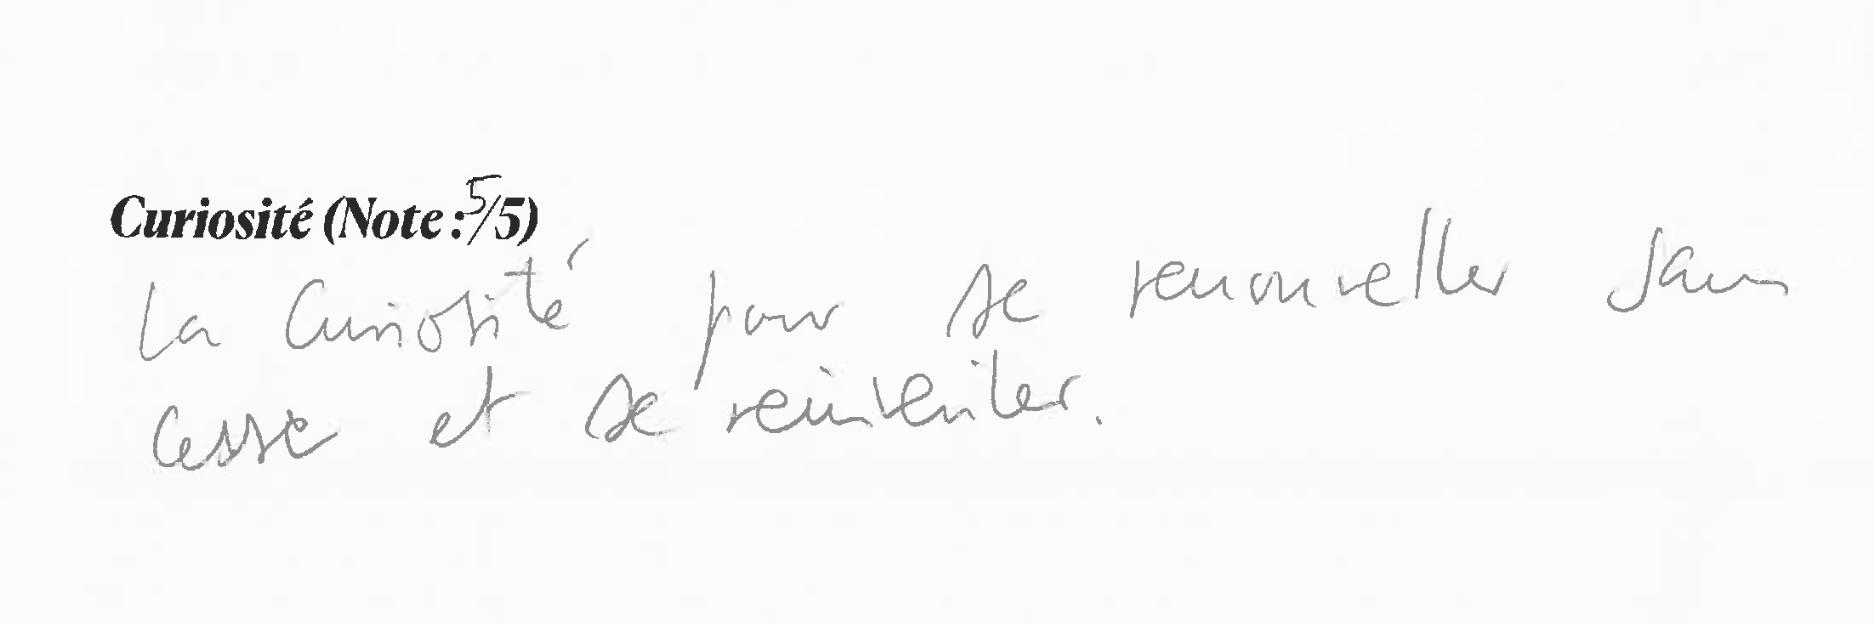 Beside Sport - Le joaillier Lorenz Bäumer -  -